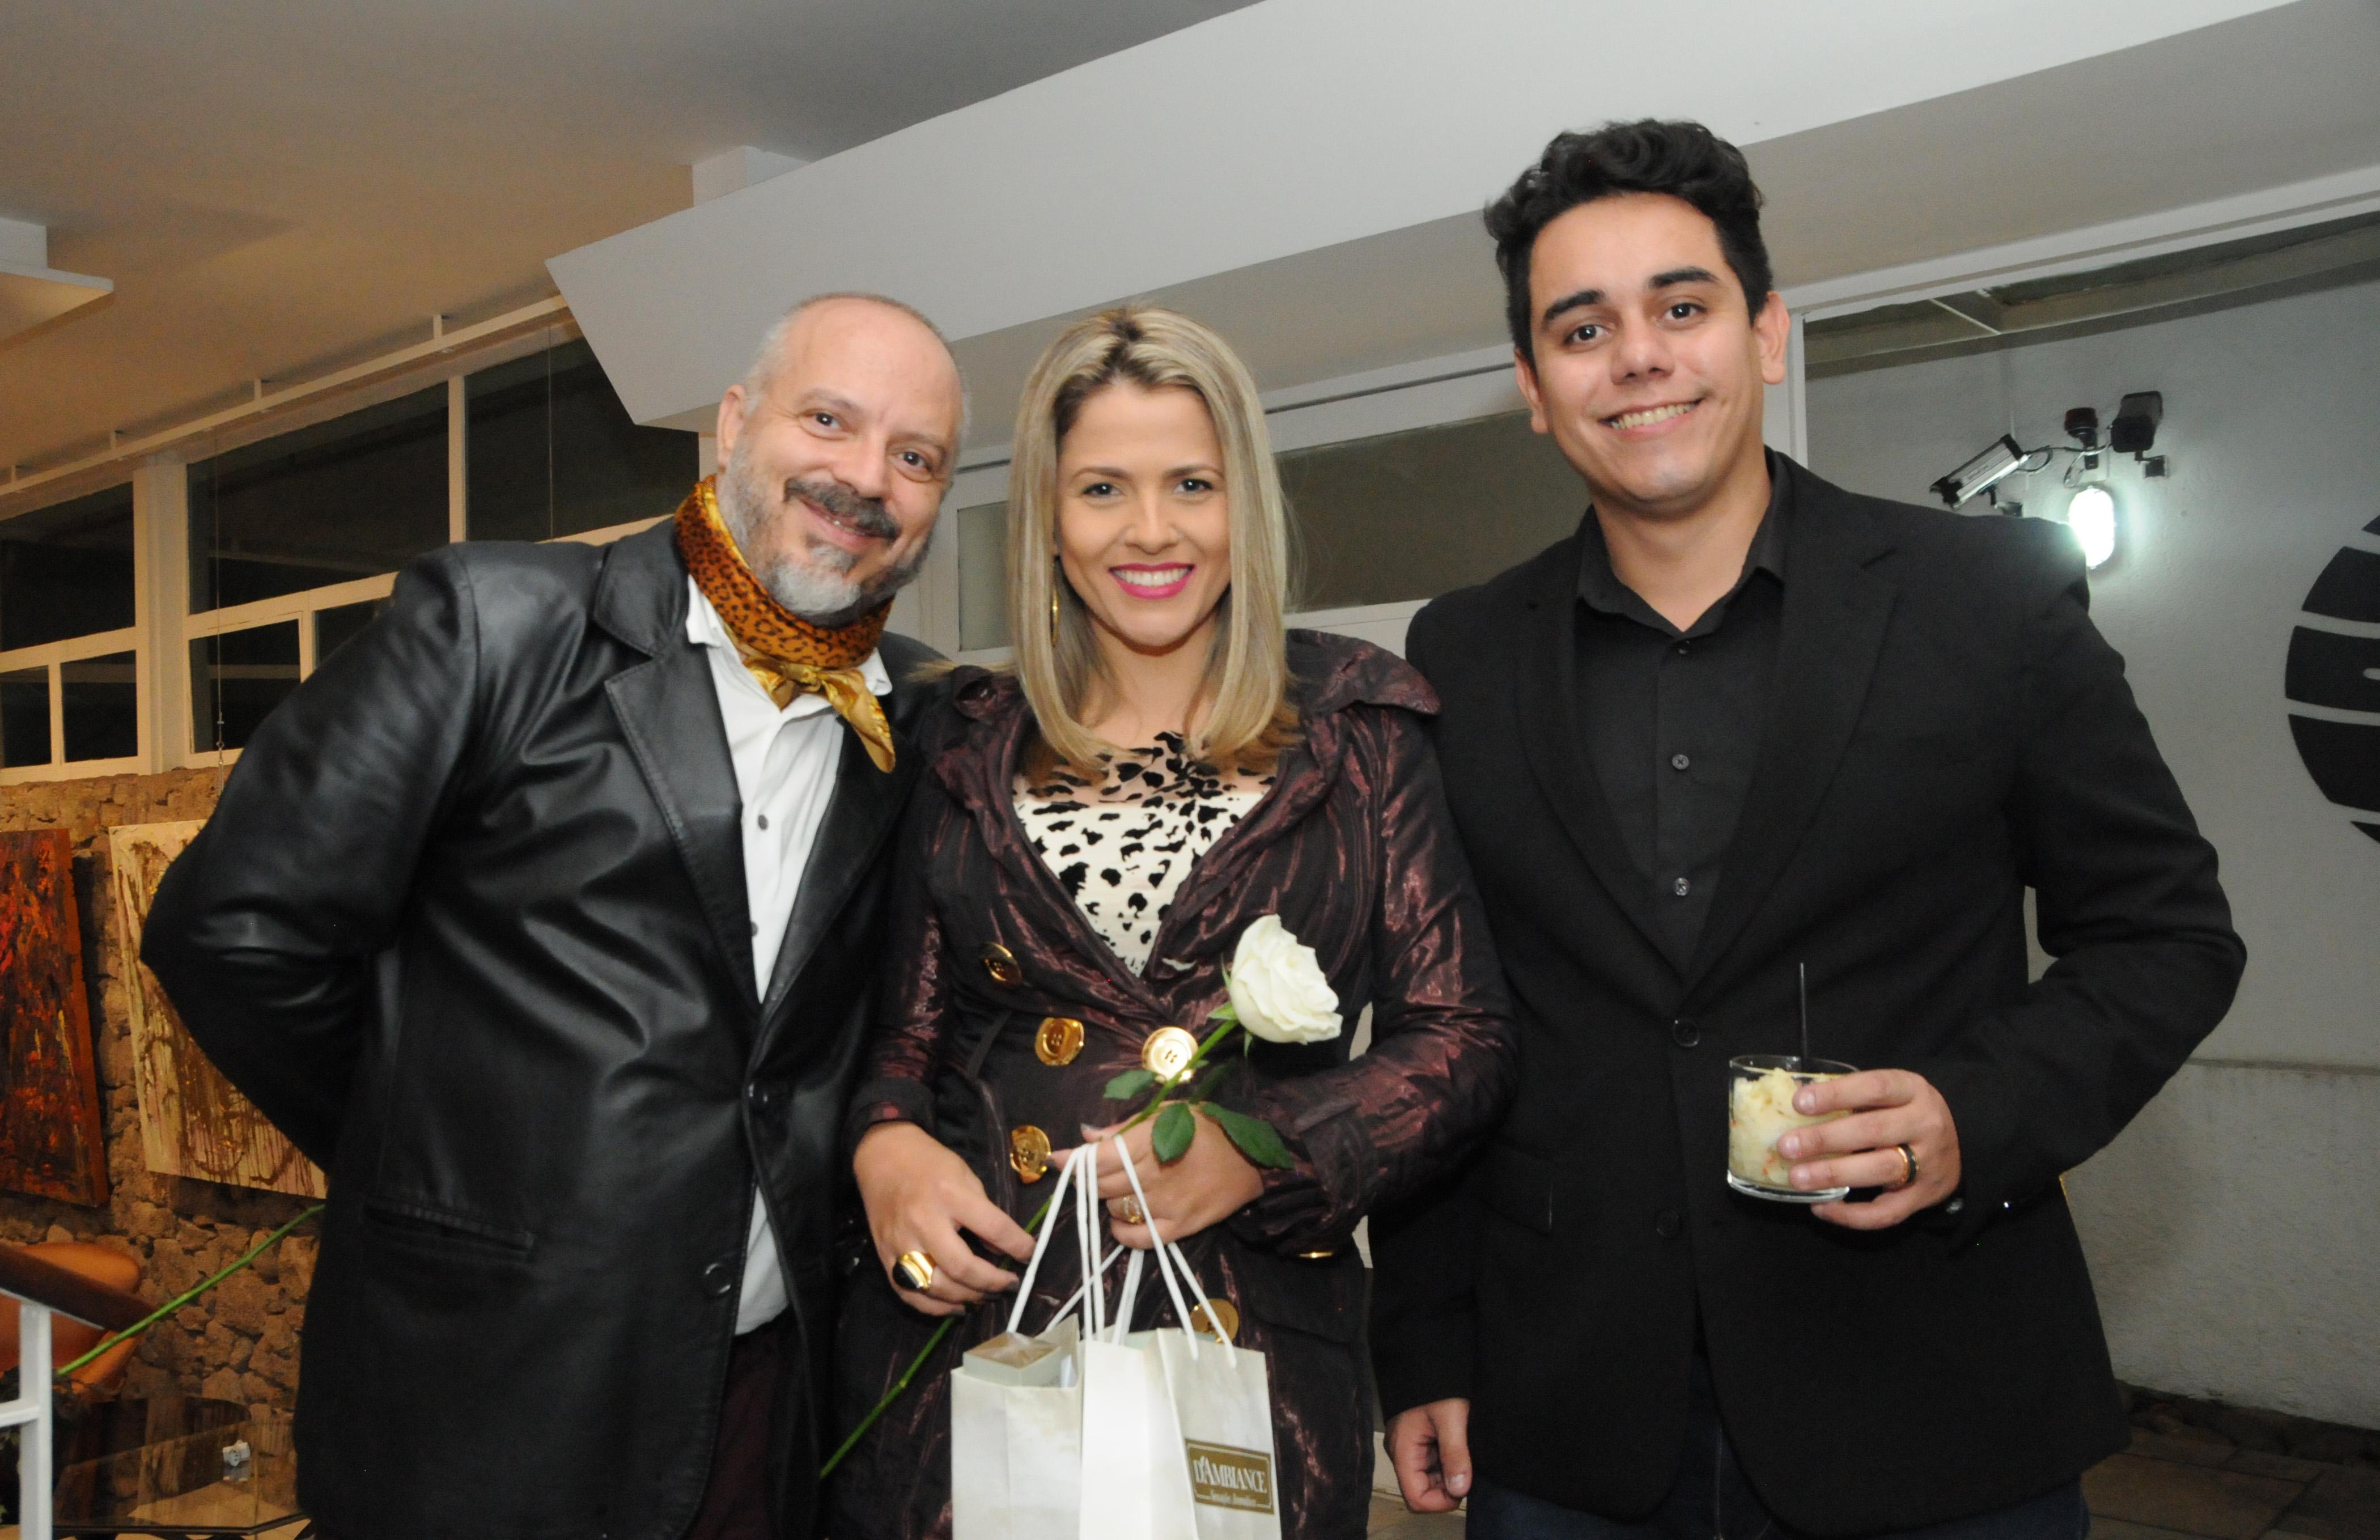 Julio Cesar Dantes, Vanessa silvestre e Vcenzo Bianchini